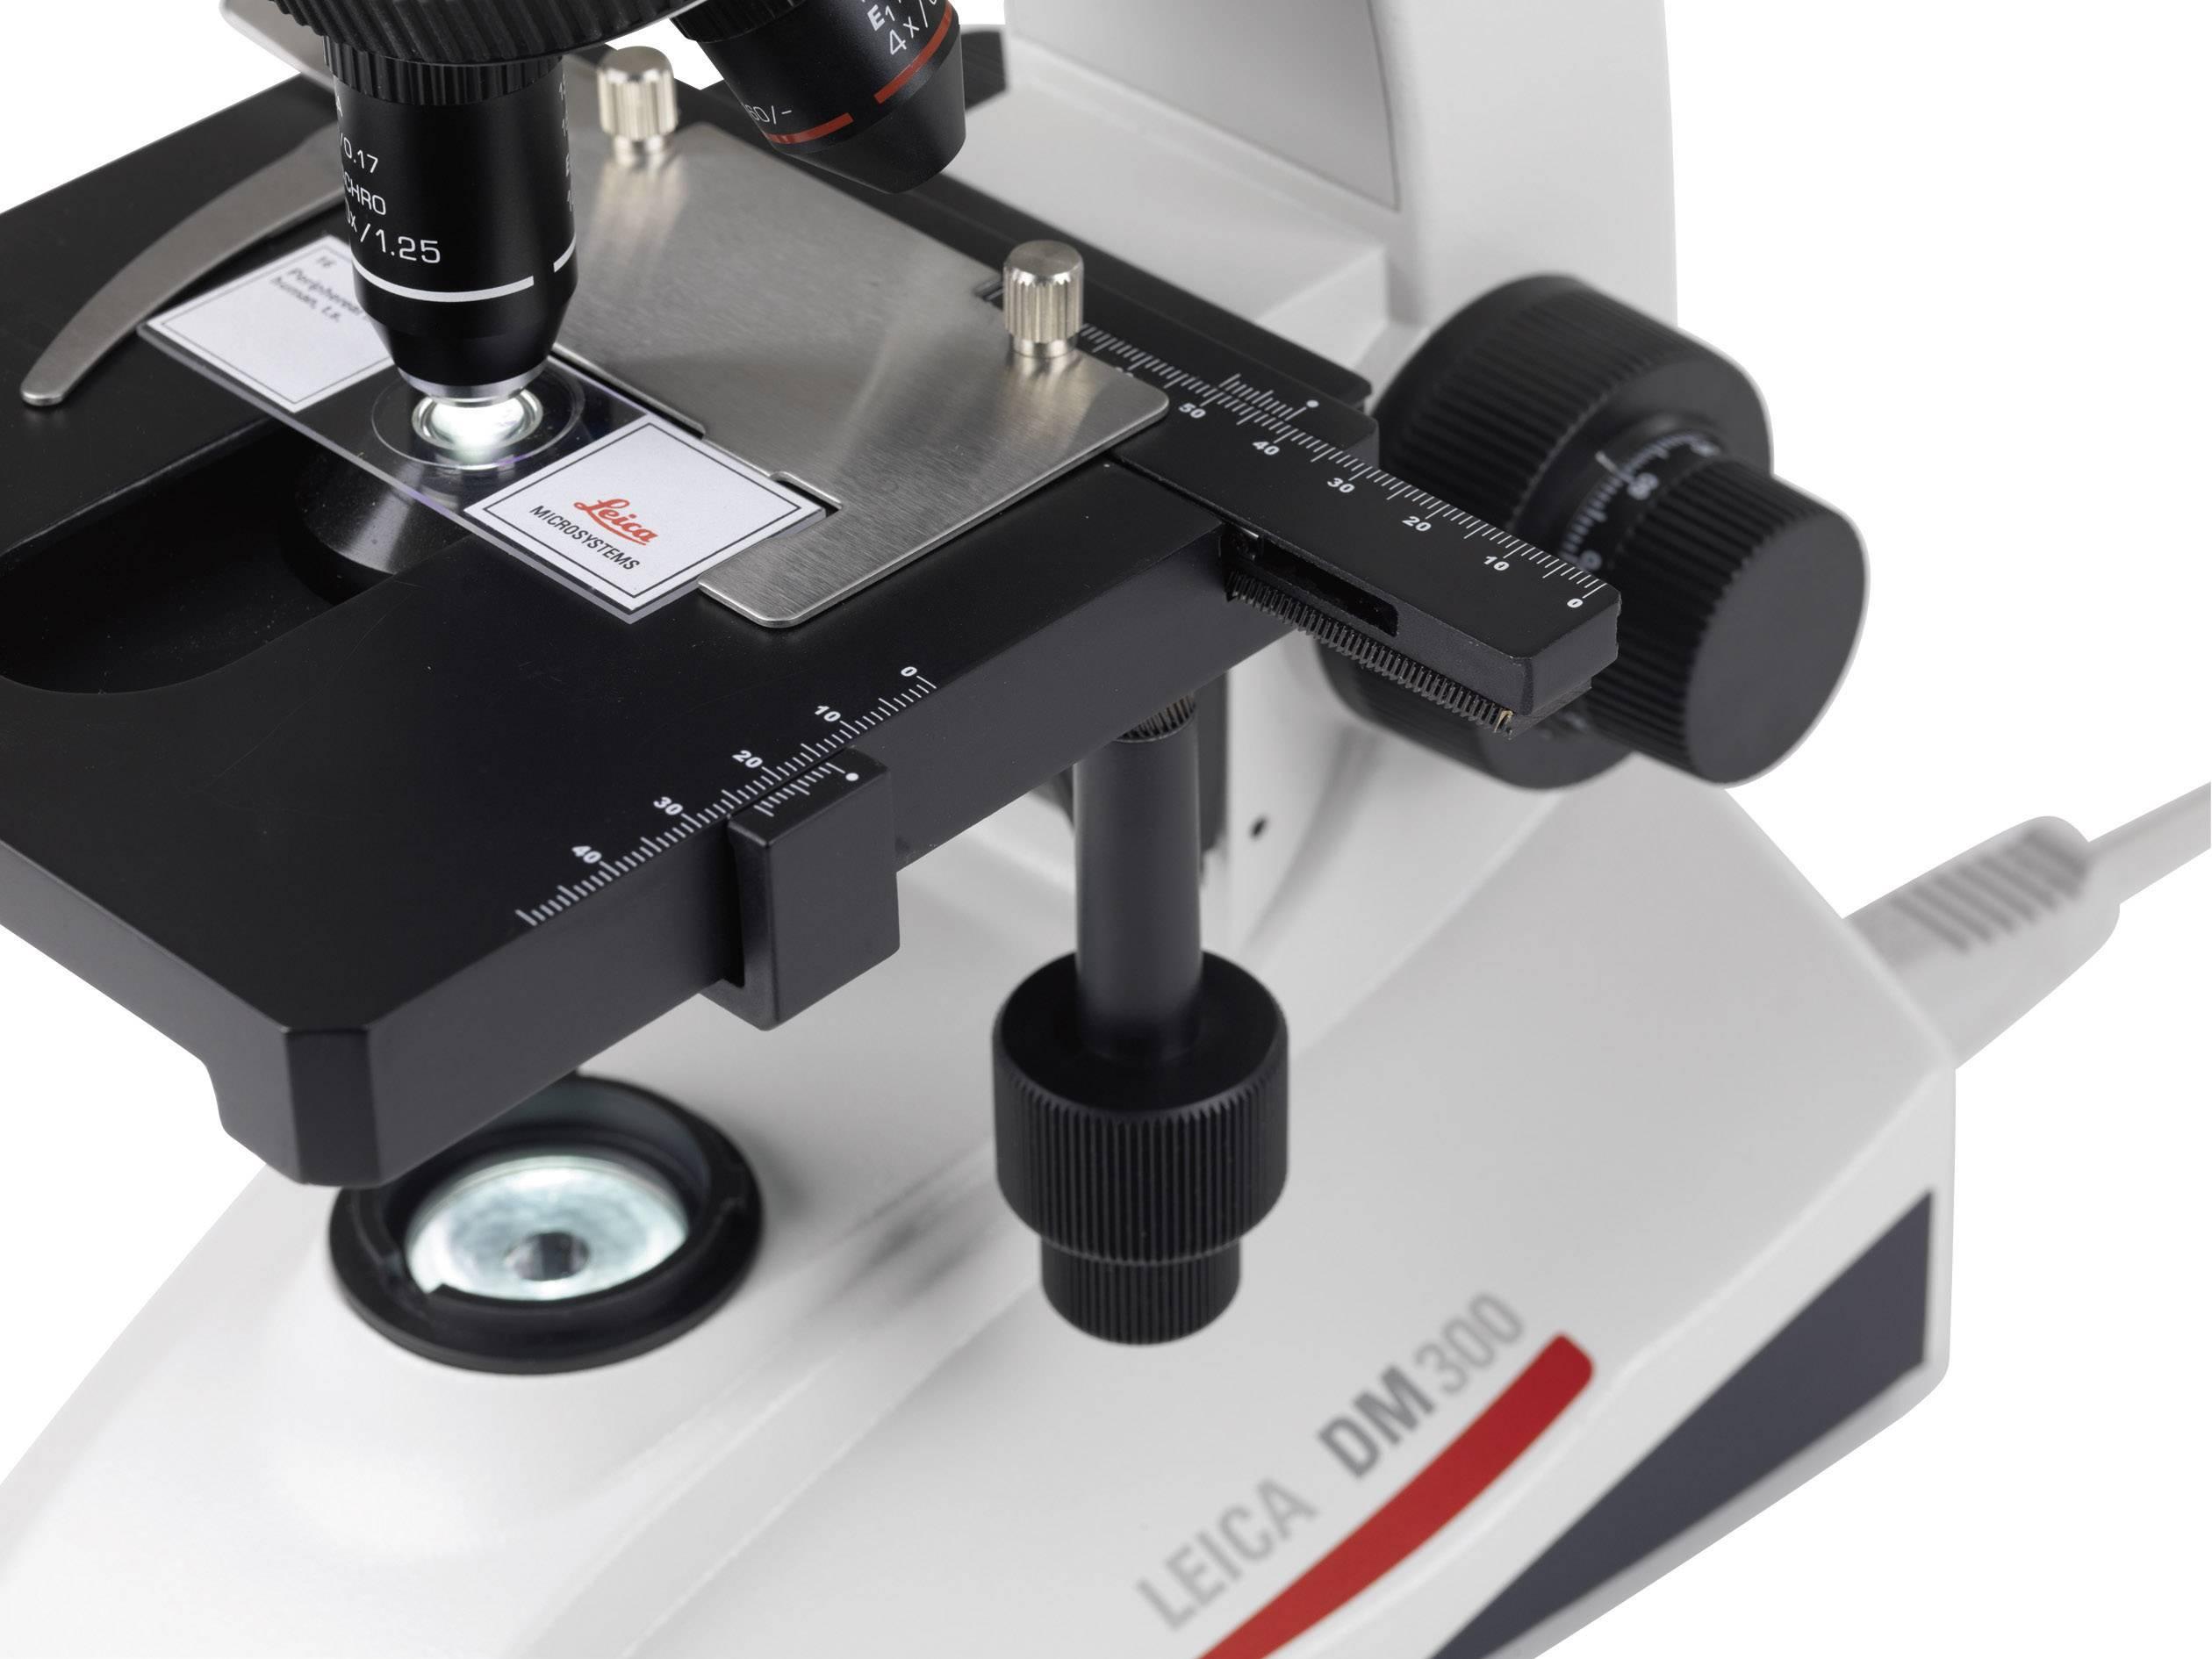 Mikroskop Leica Microsystems DM300, binokulárny, achromát, 4x, 10x, 40x, 100x, 13613305